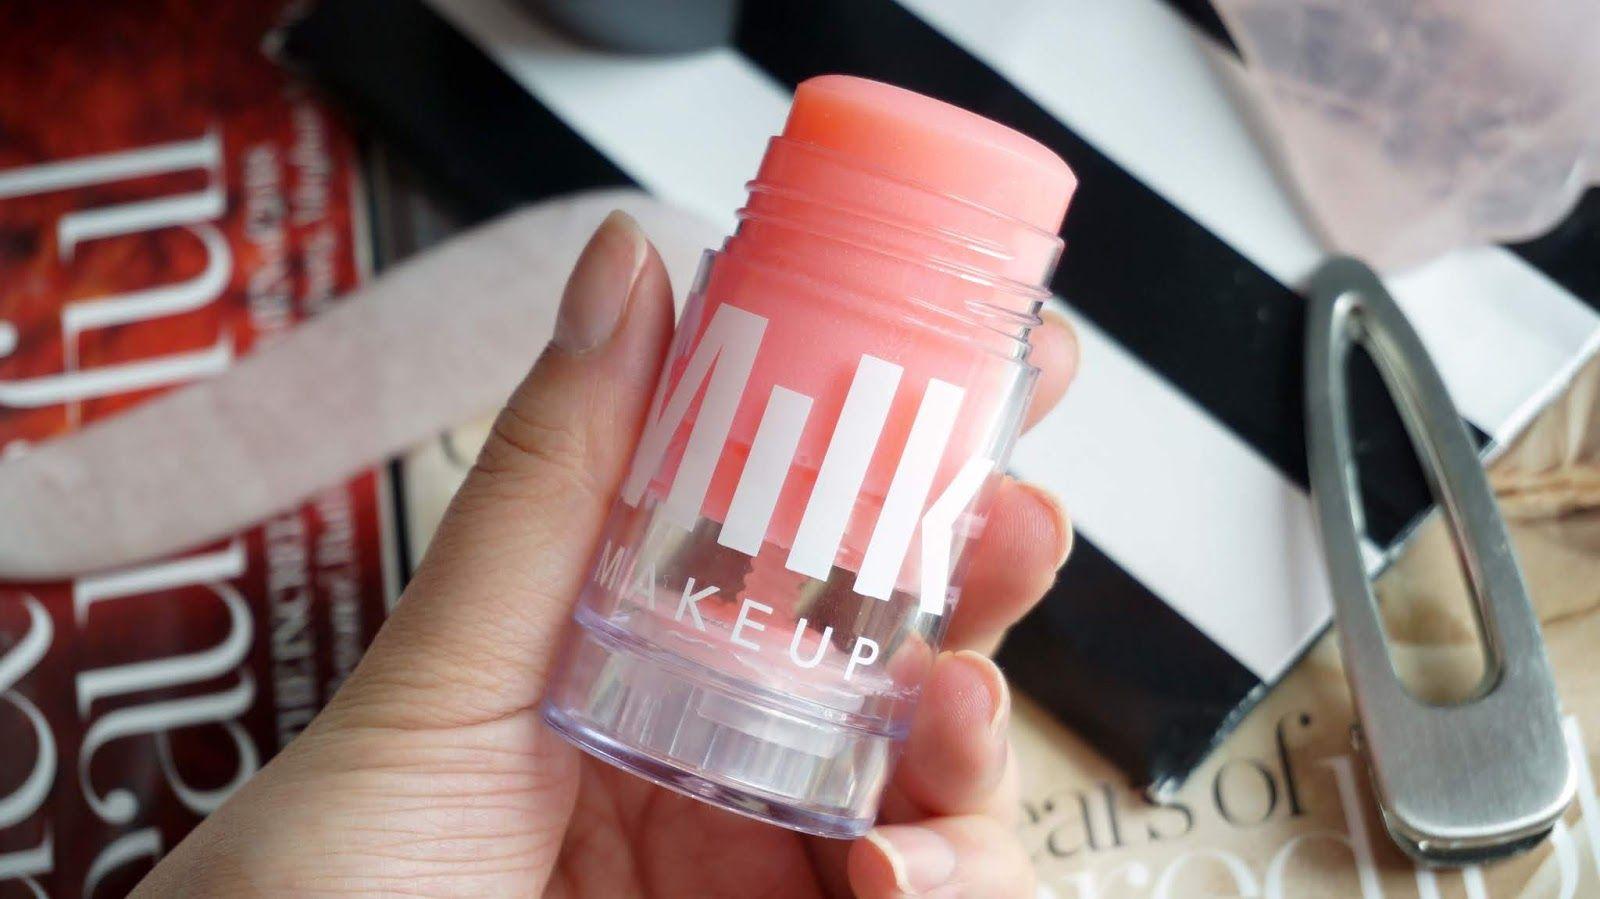 JOYCE LAU Milk makeup watermelon brightening serum review